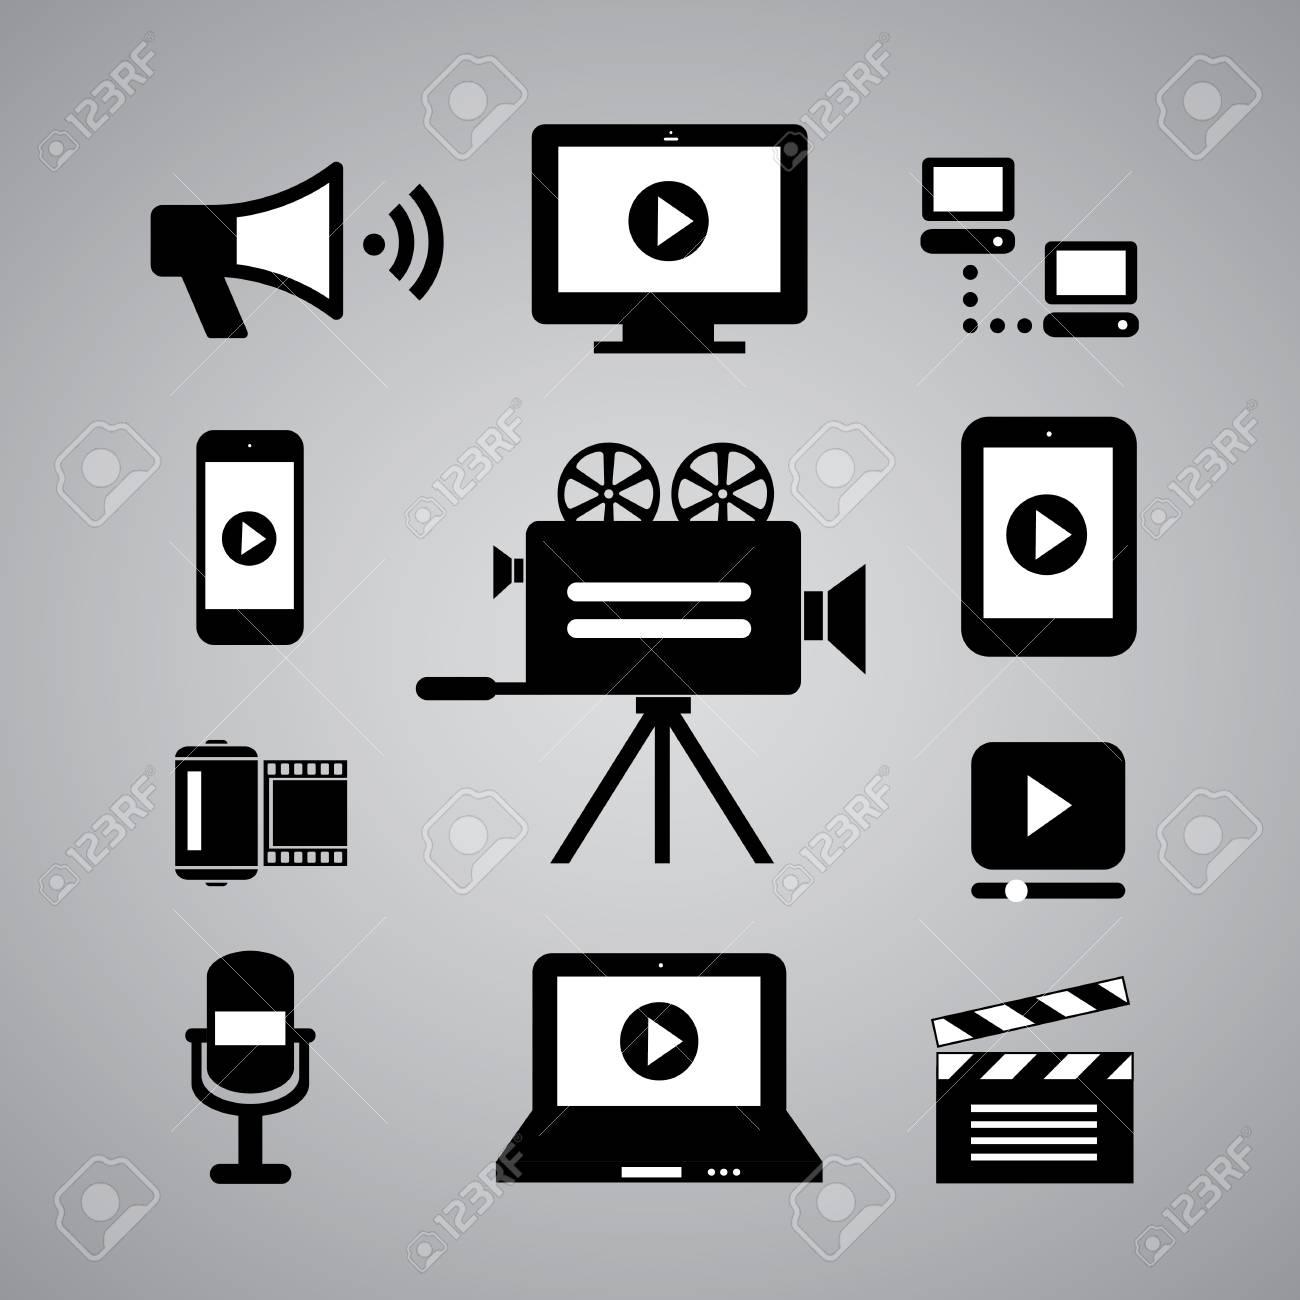 media symbol on gray background Stock Vector - 21569115